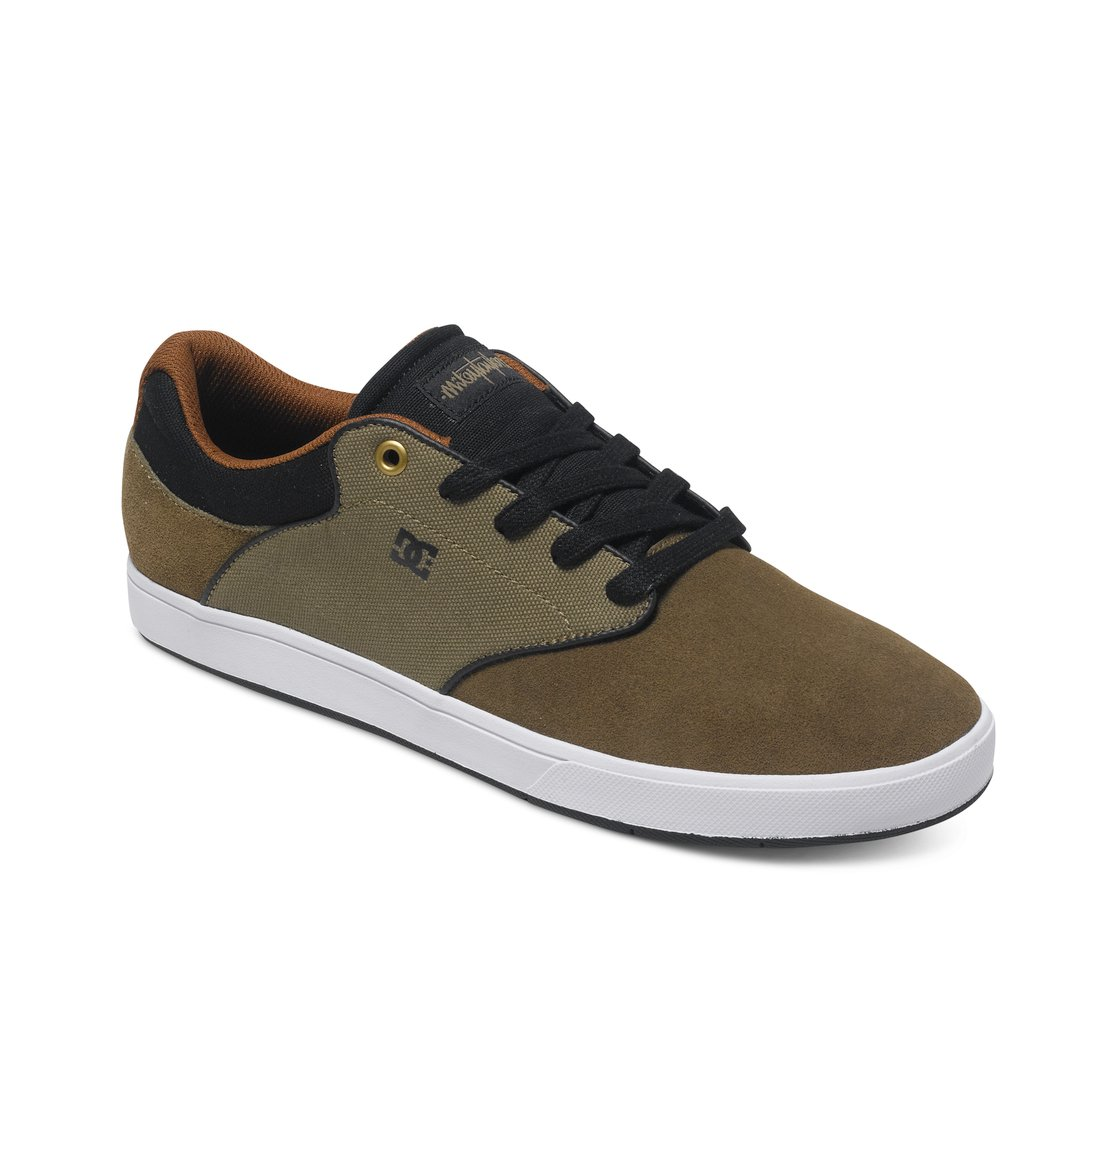 Купить Обувь для скейтборда   Mikey Taylor S